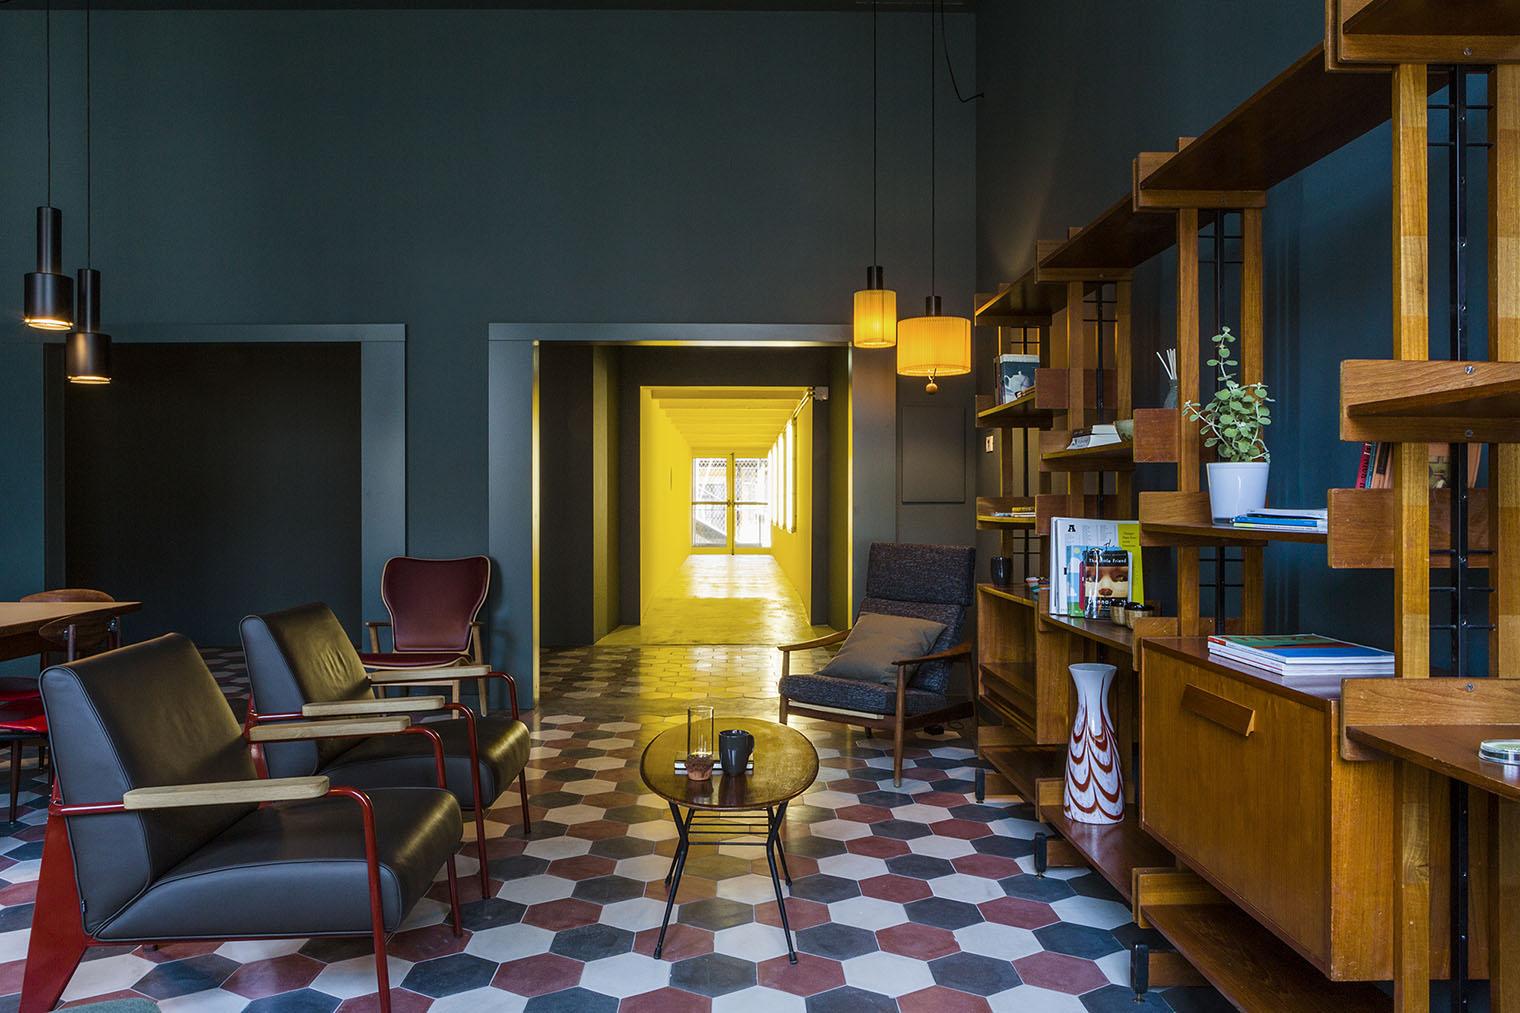 Hotel casabase en mil n hogar de art stas - Hotel hogar leioa ...